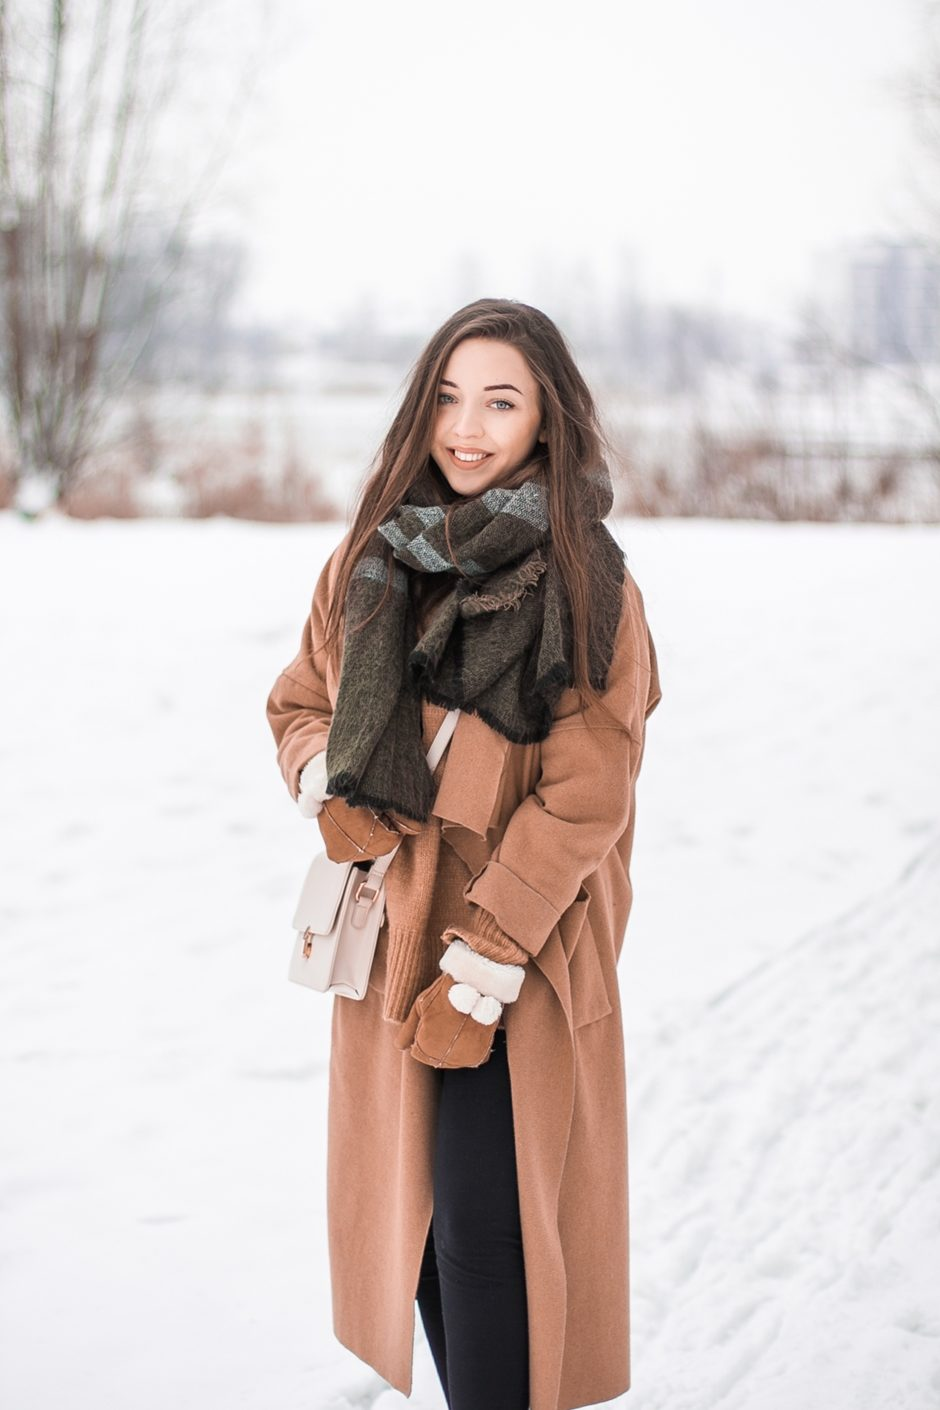 Ulubiona stylizacja zimowa